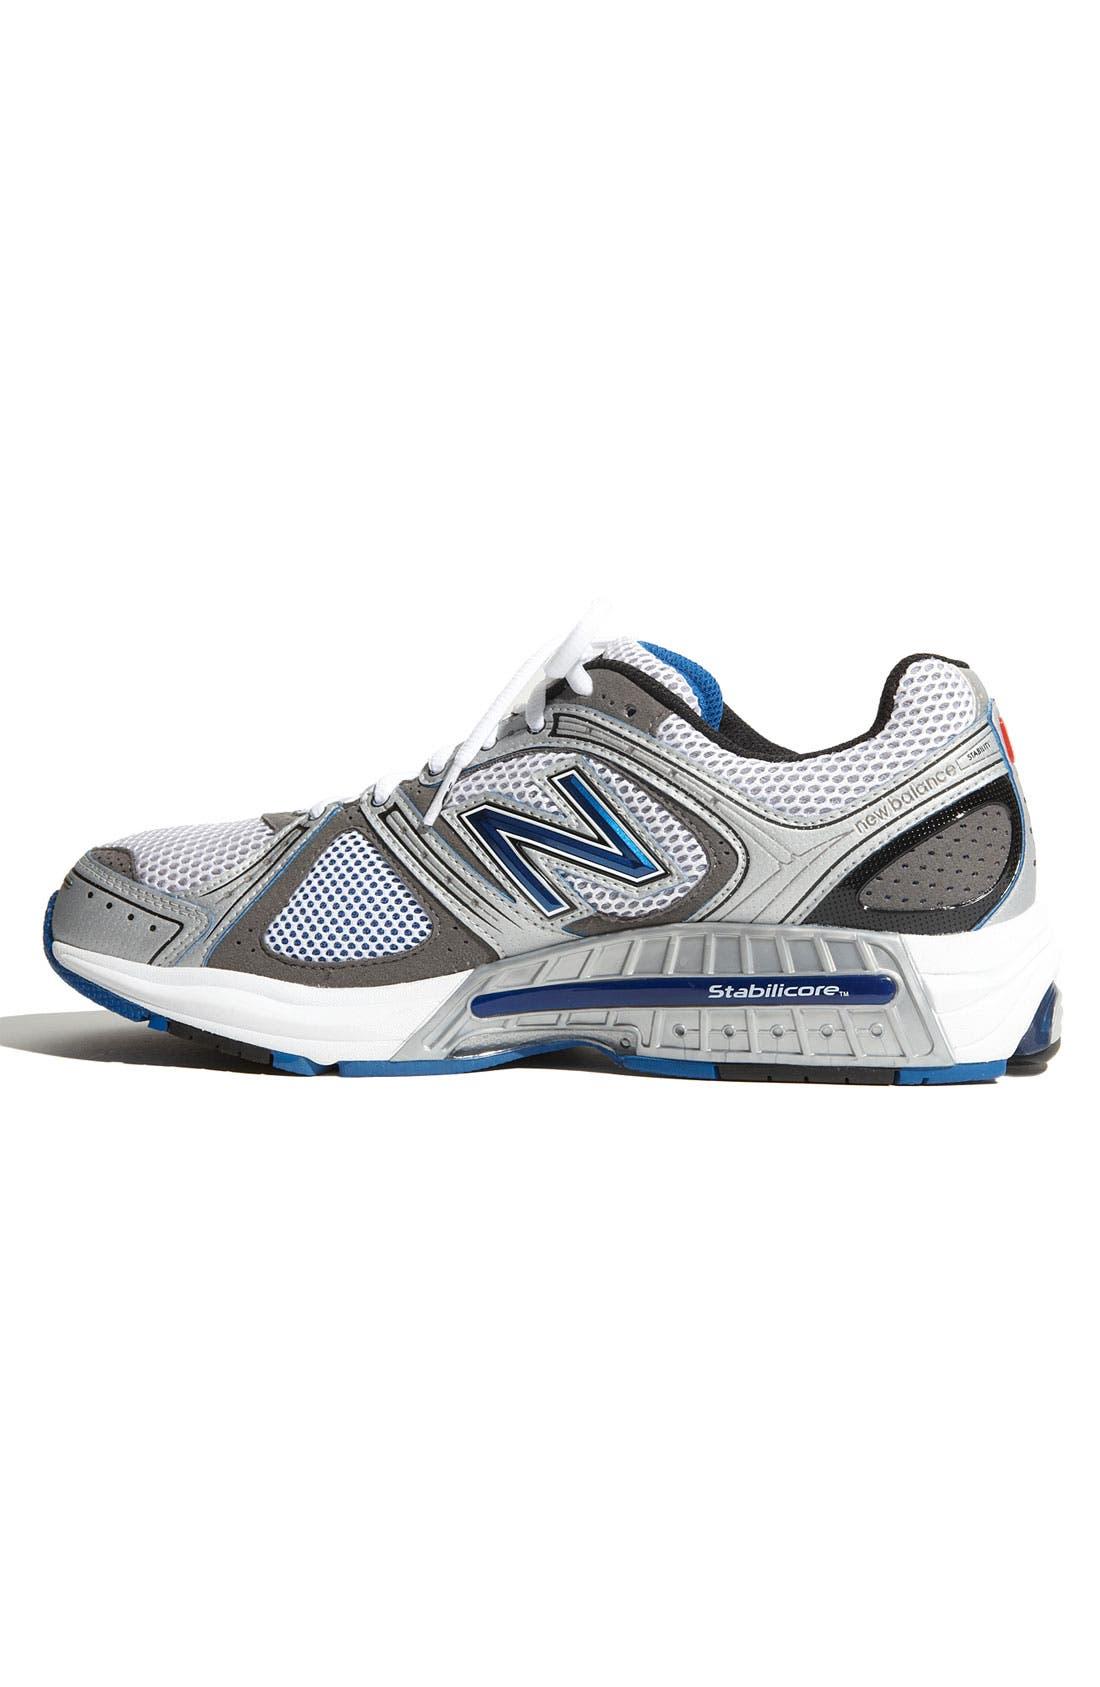 Alternate Image 3  - New Balance '940' Running Shoe (Men) (Online Only)